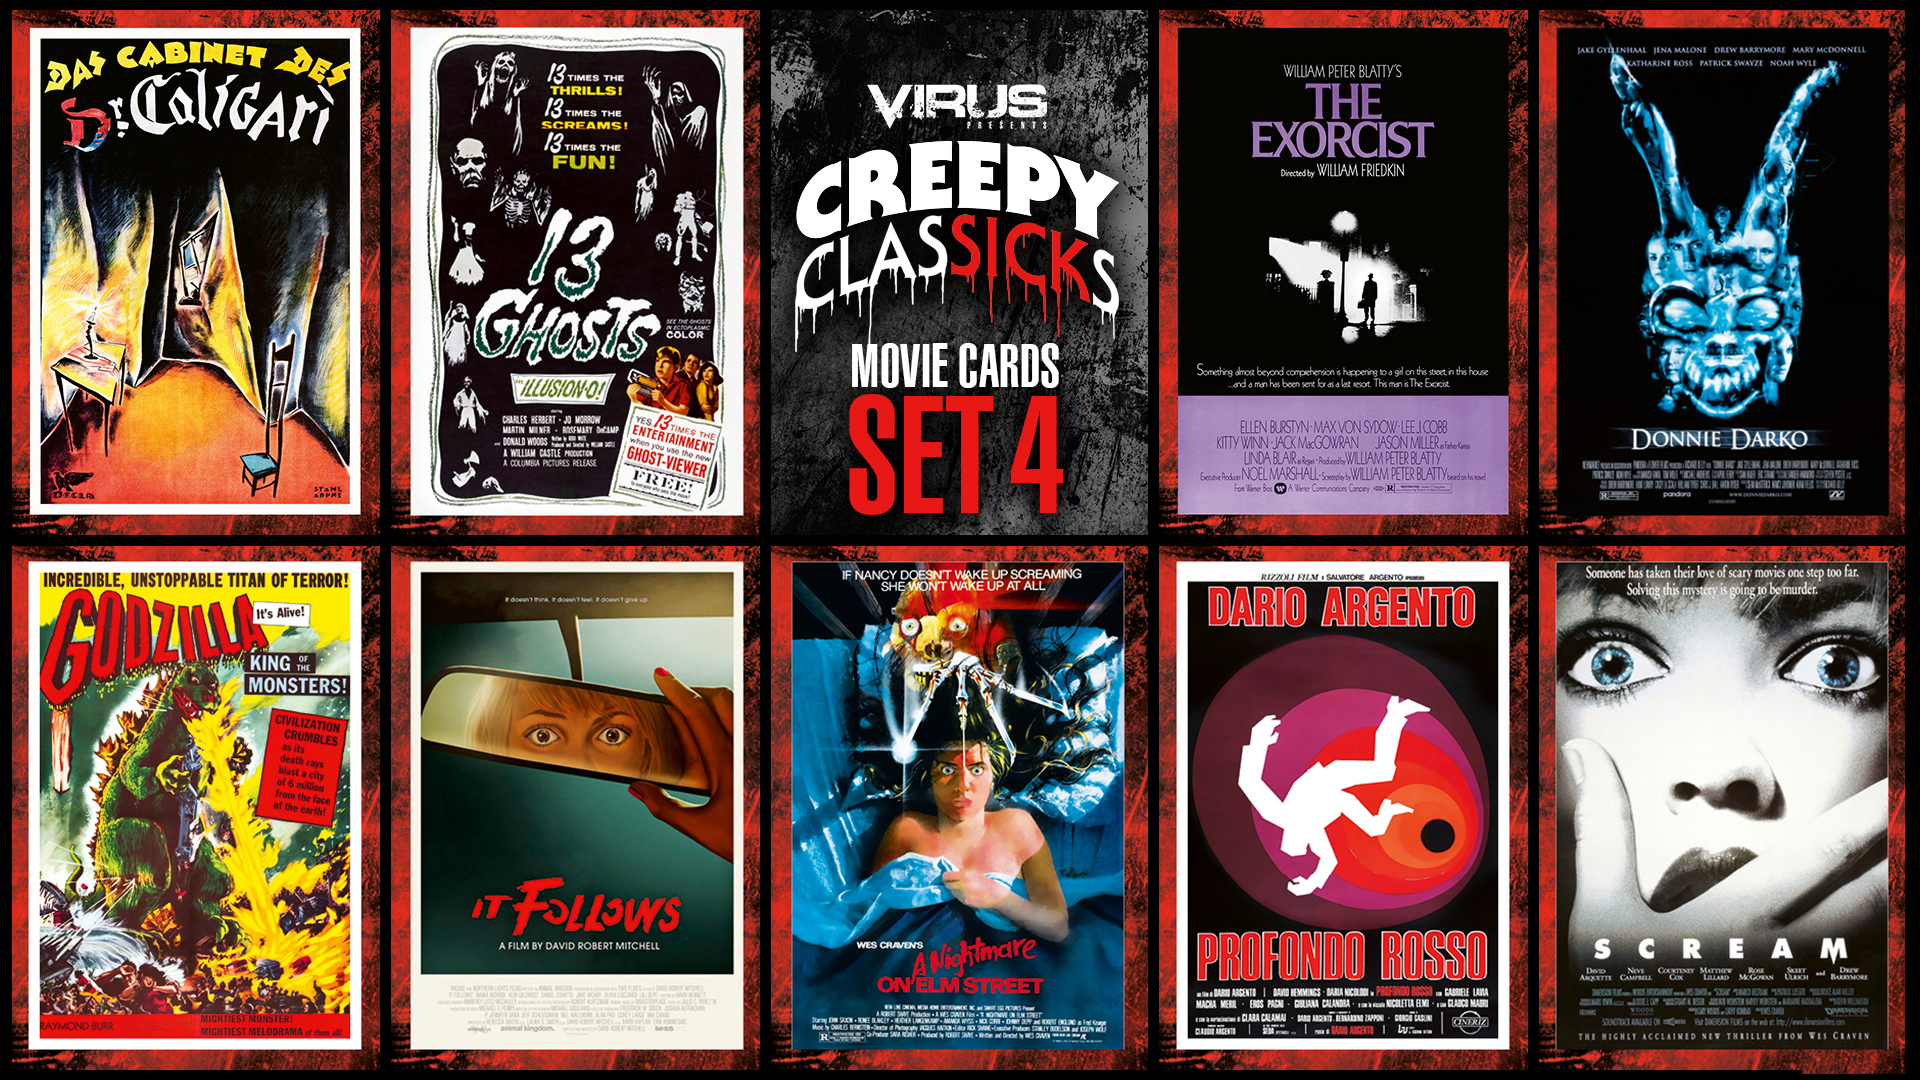 VIRUS Creepy ClasSICKs Movie Cards Set #04